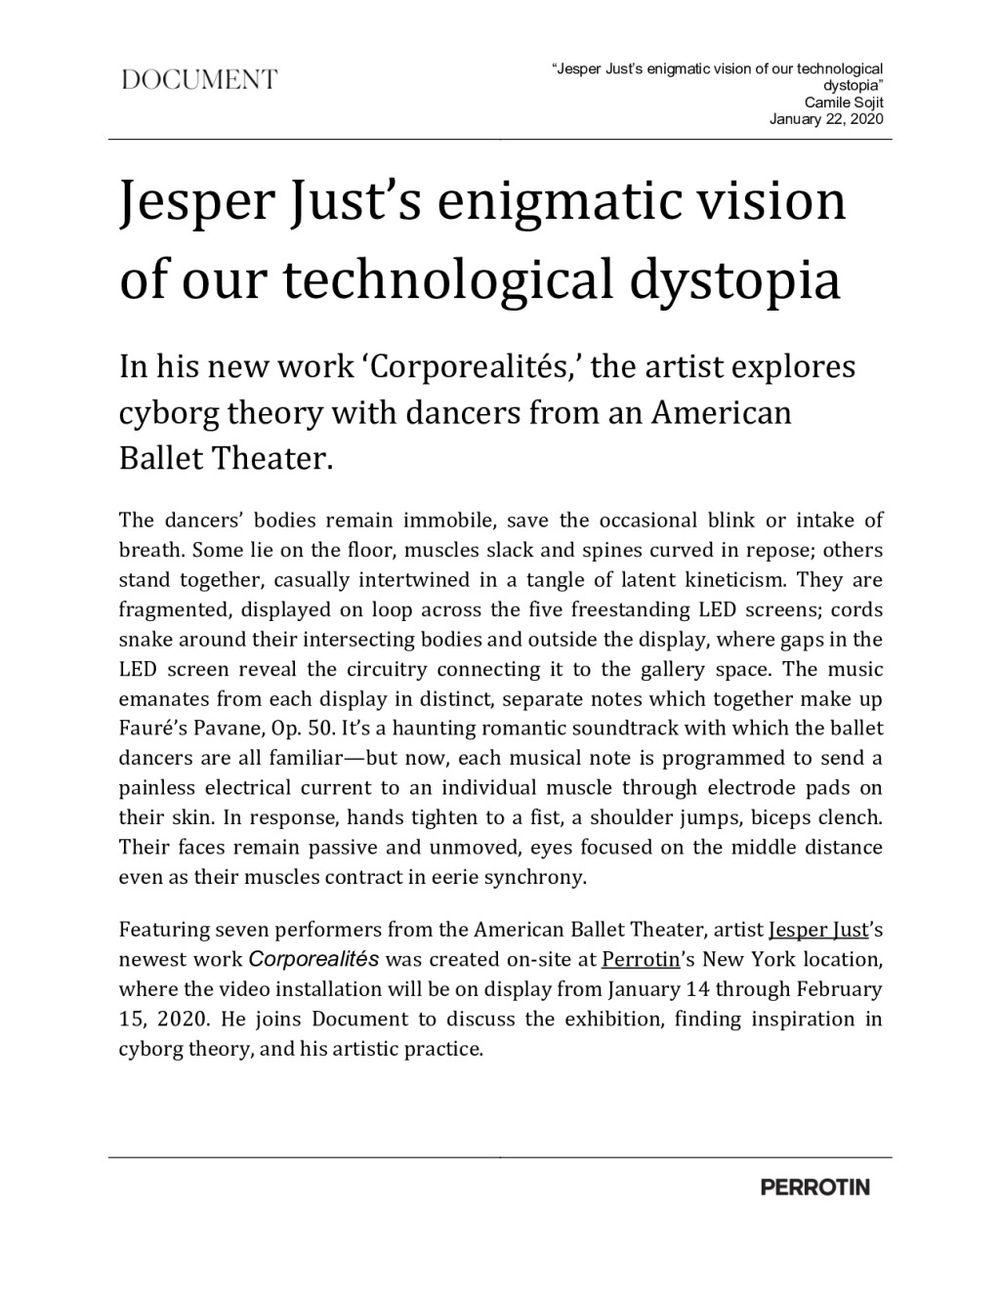 Document Journal | Jesper JUST